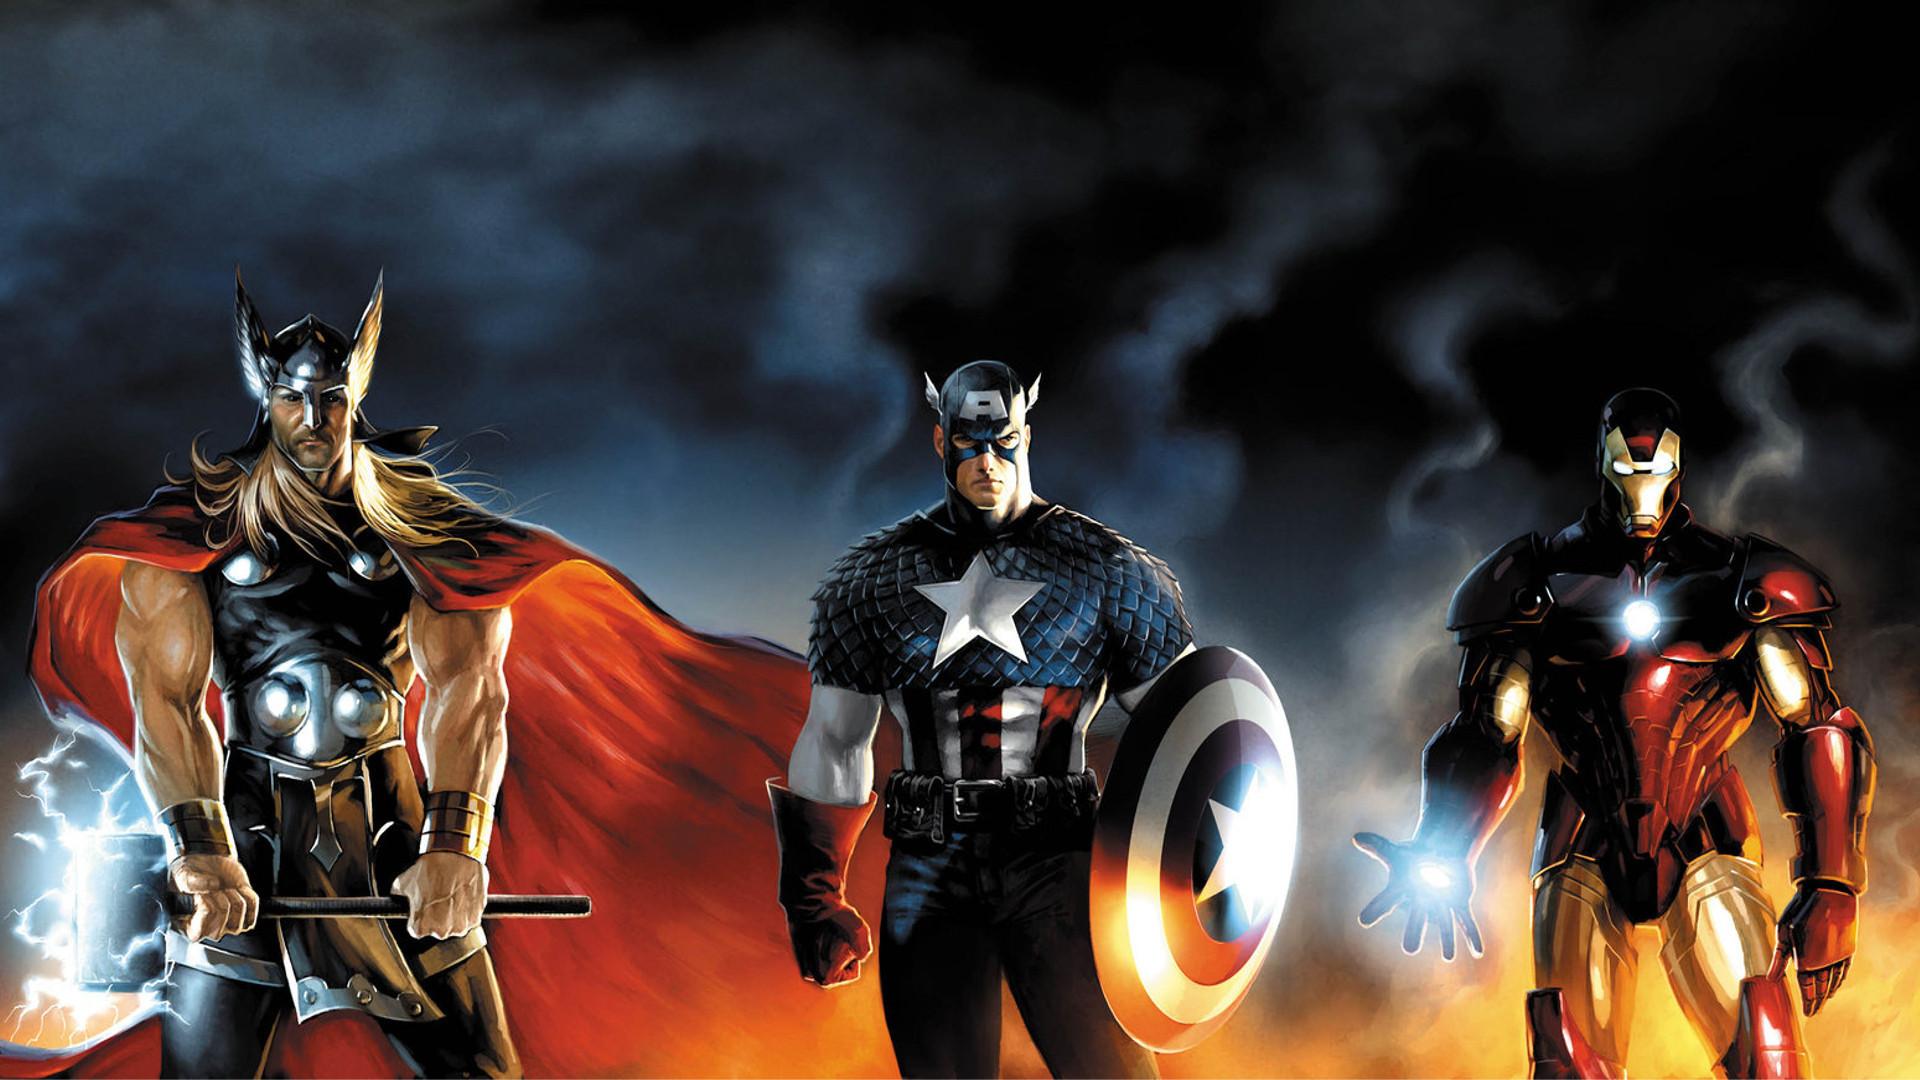 Captain-America-Shield-Hd-Wallpaper-For-Ipad (1)